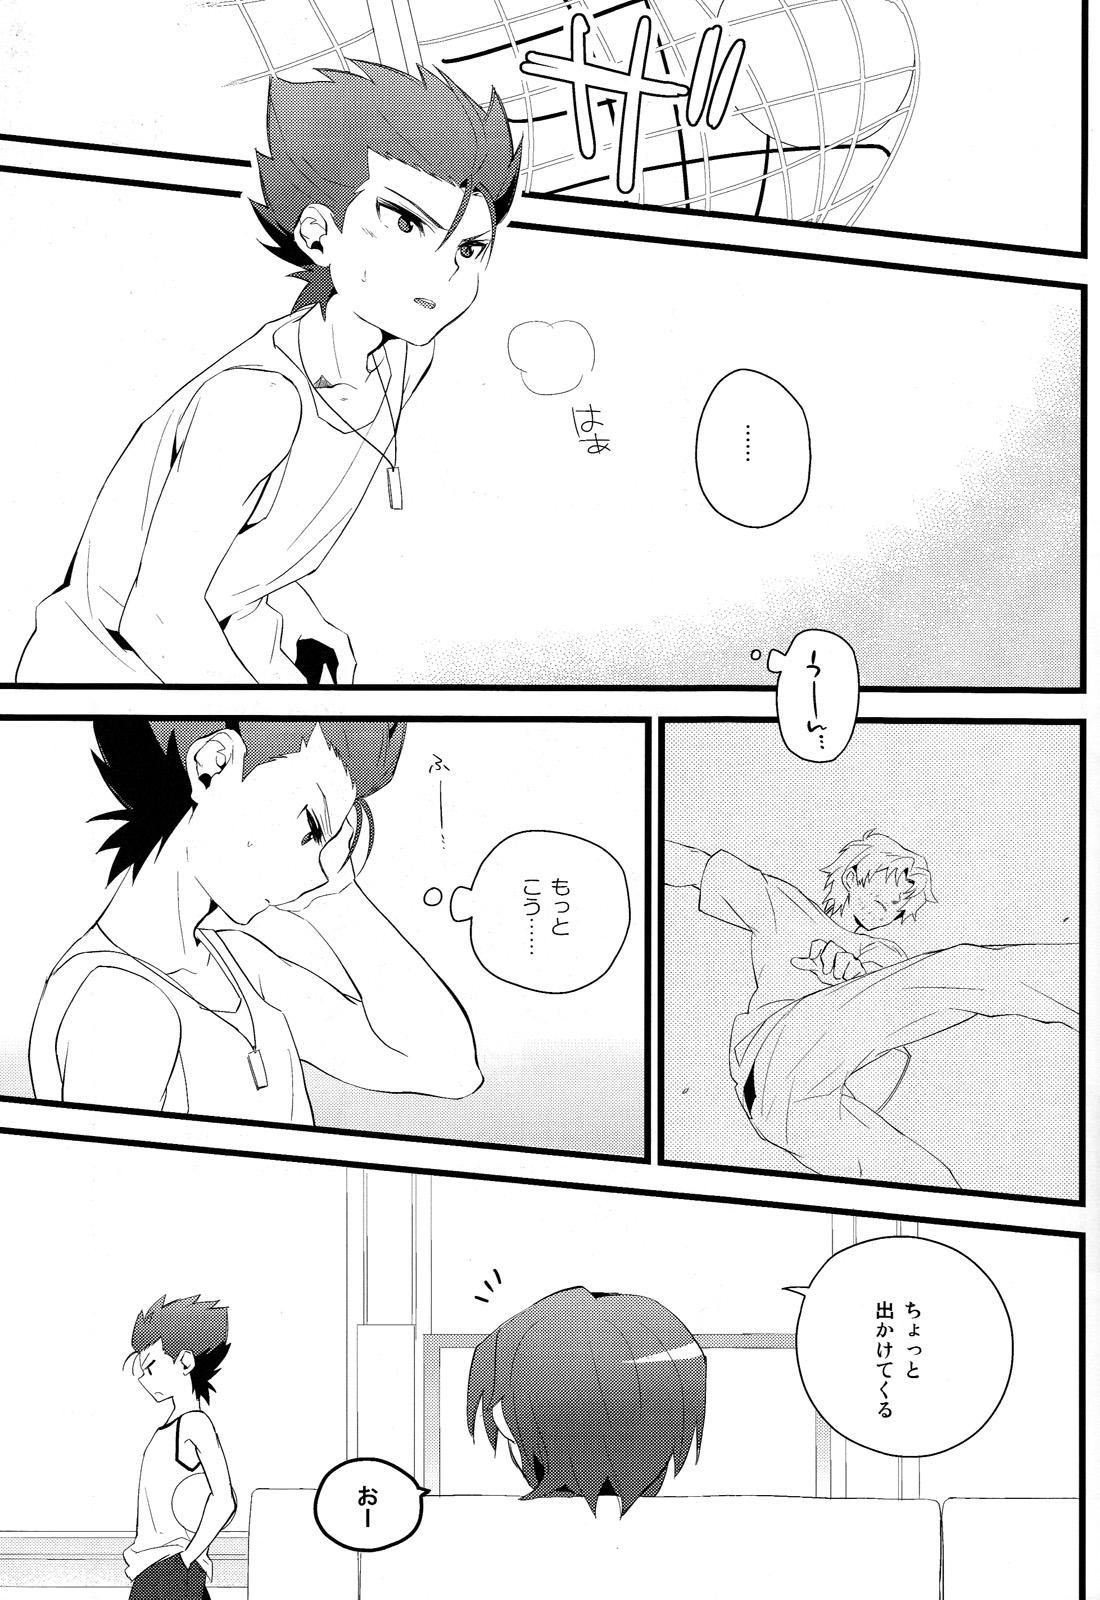 Zenbu Coach no Shigoto 3